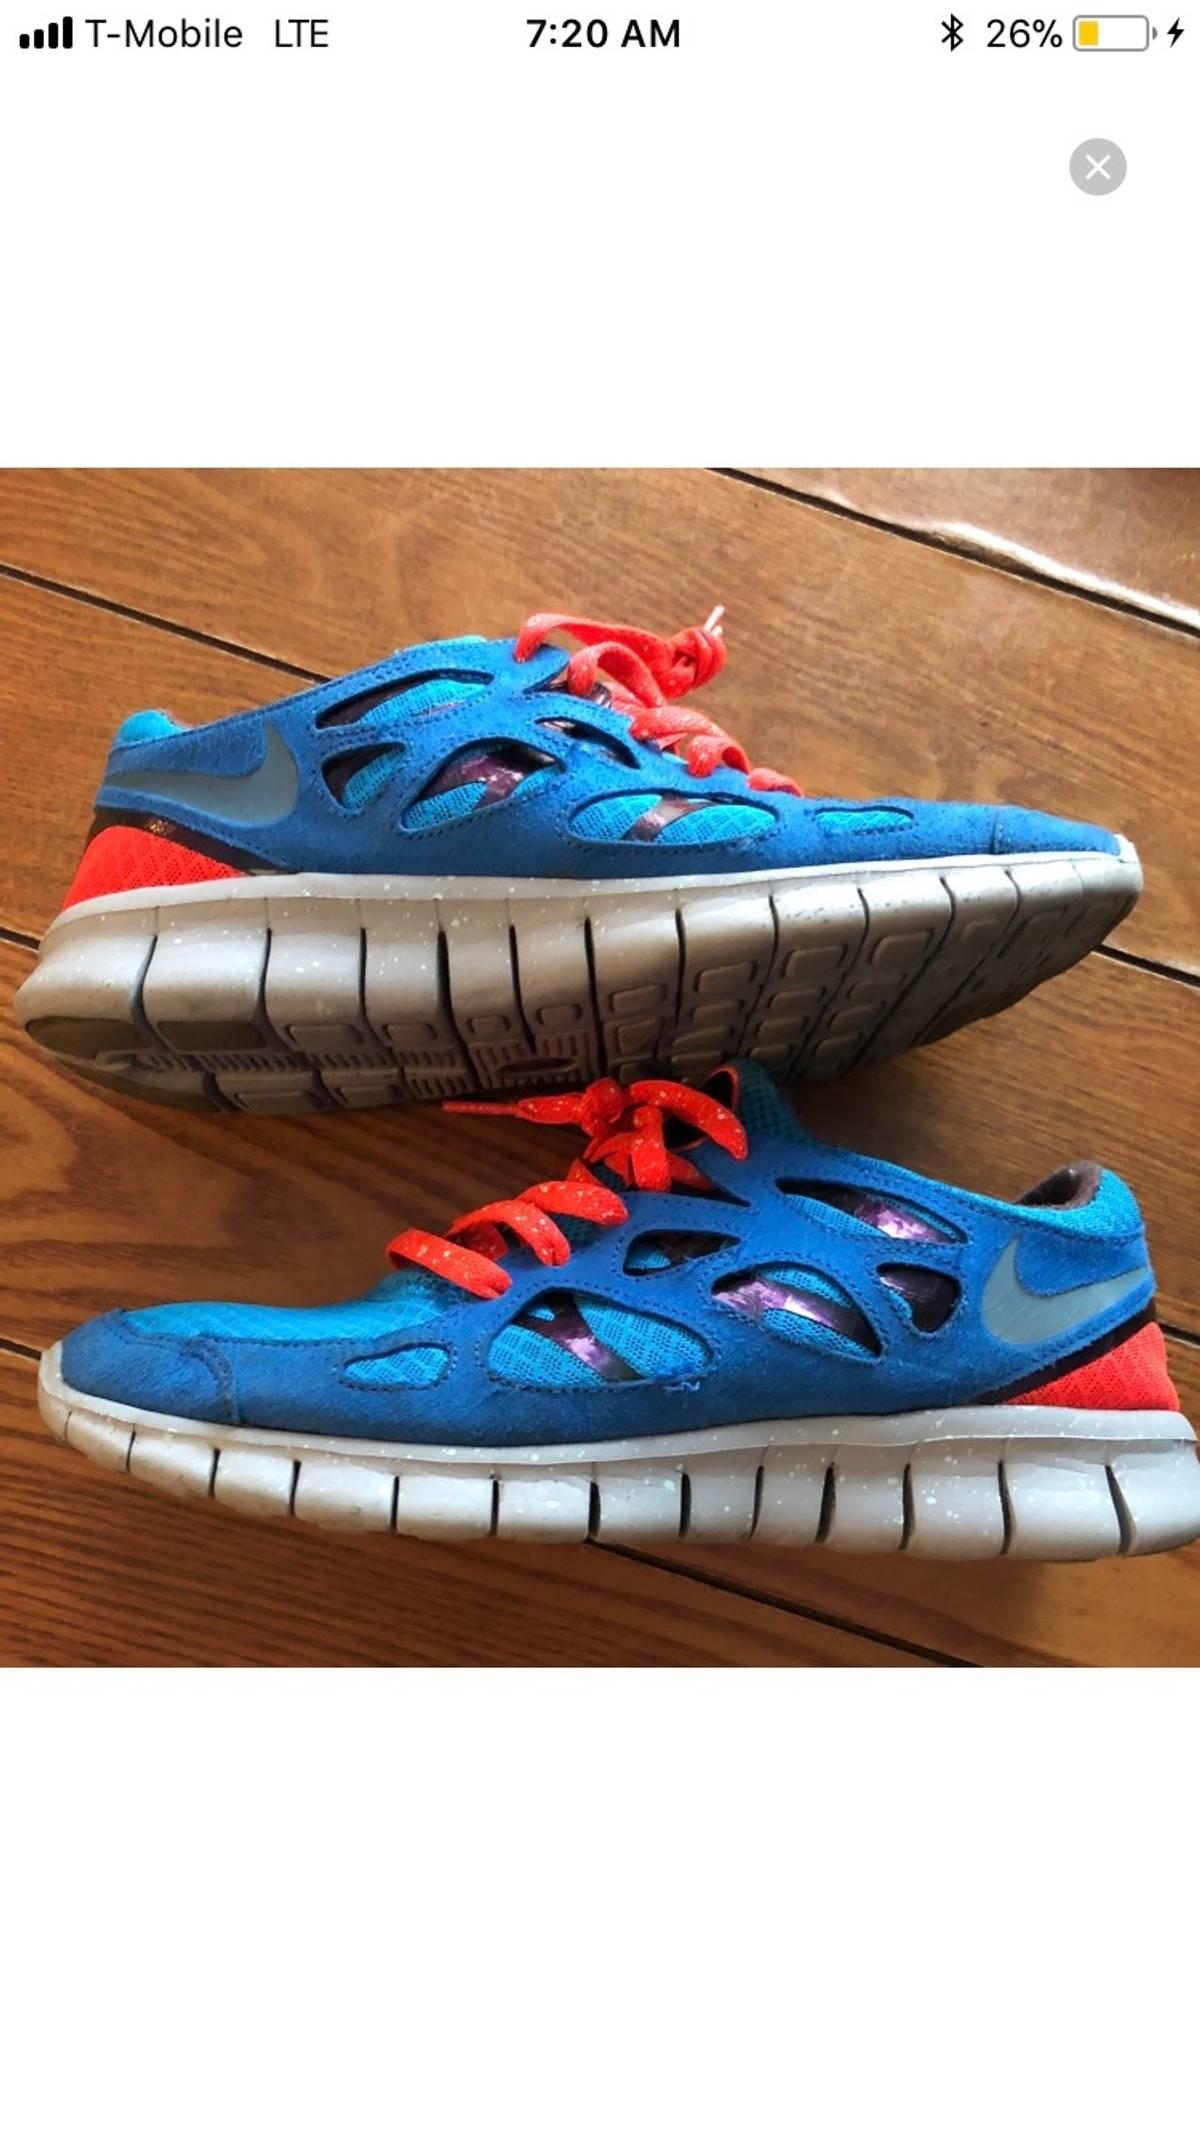 reputable site 8e737 5bbe8 Nike ×. Doernbecher Nike Free Run 2